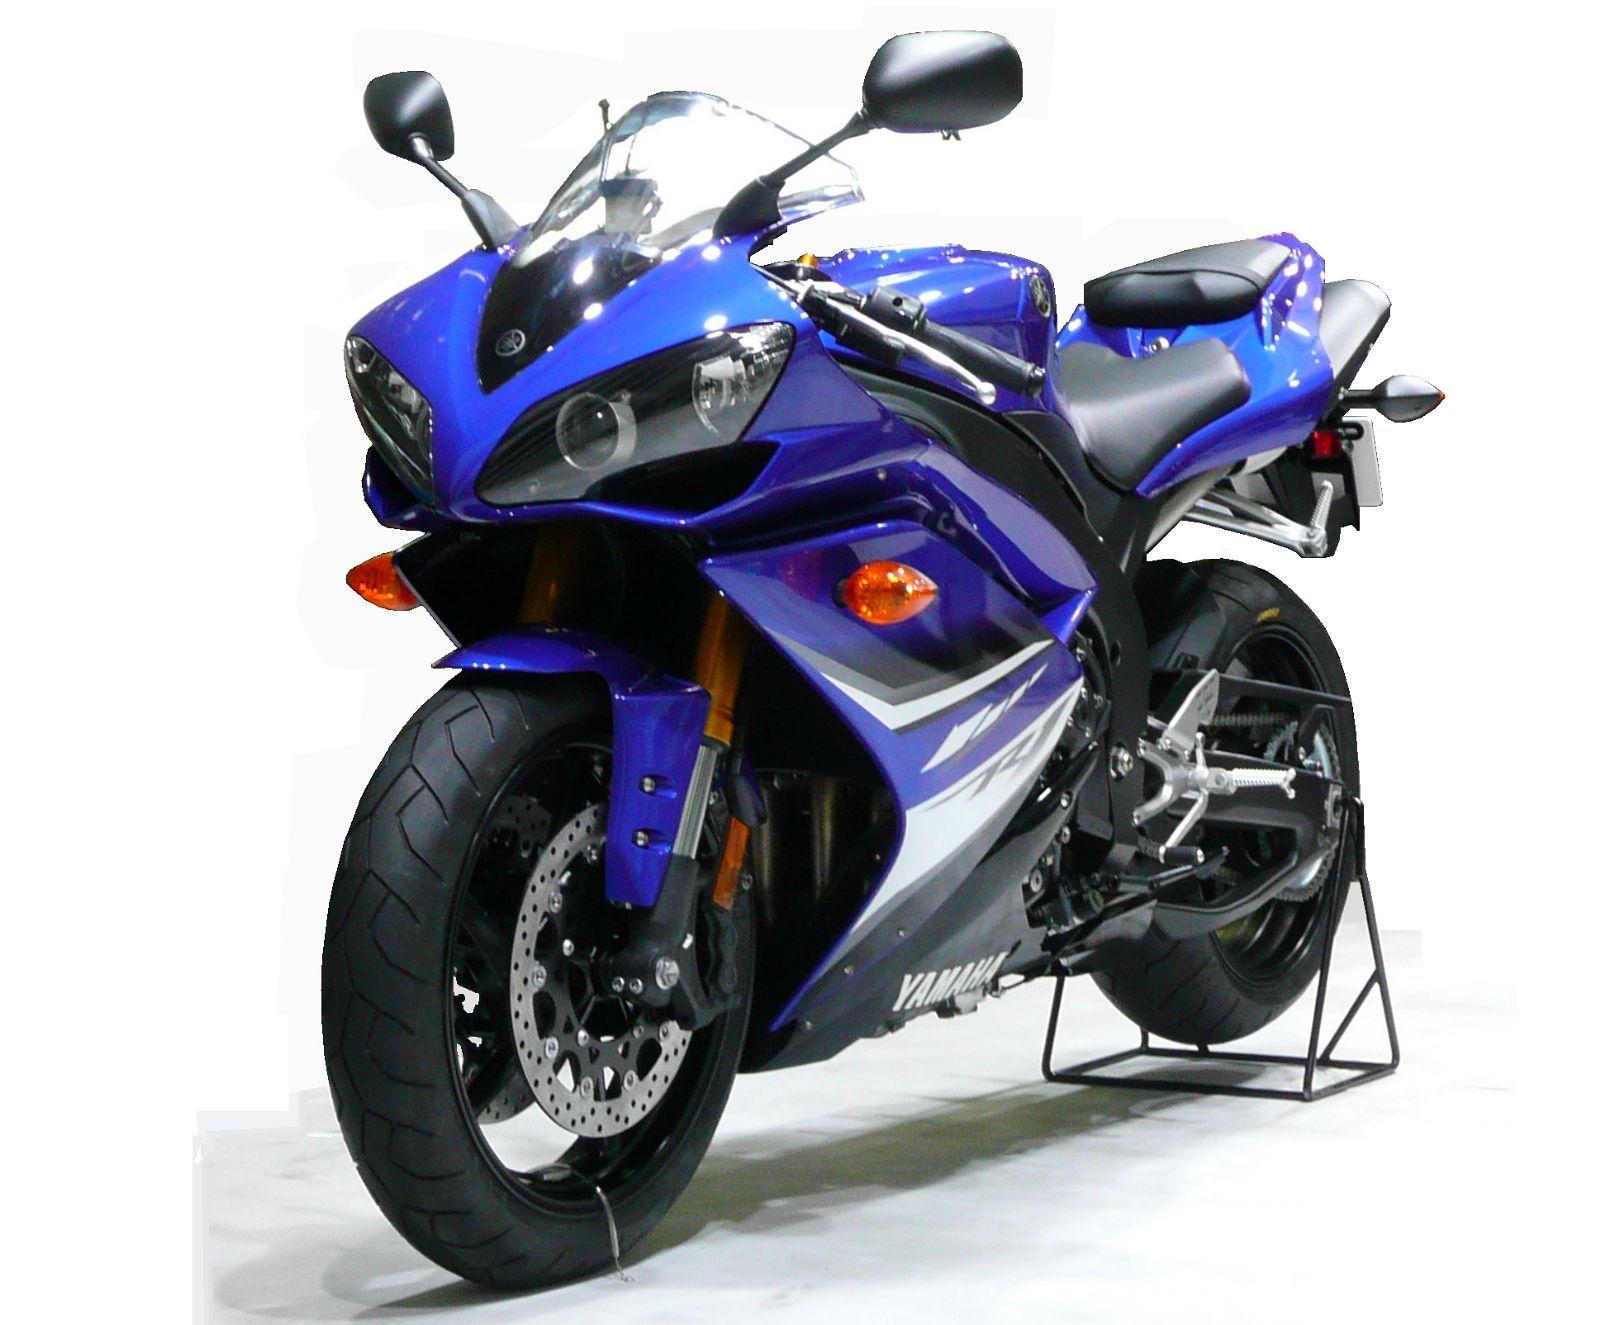 The Best Yamaha R1 Pricing Yamaha Yzf R1 Yamaha R1 Yamaha Yzf